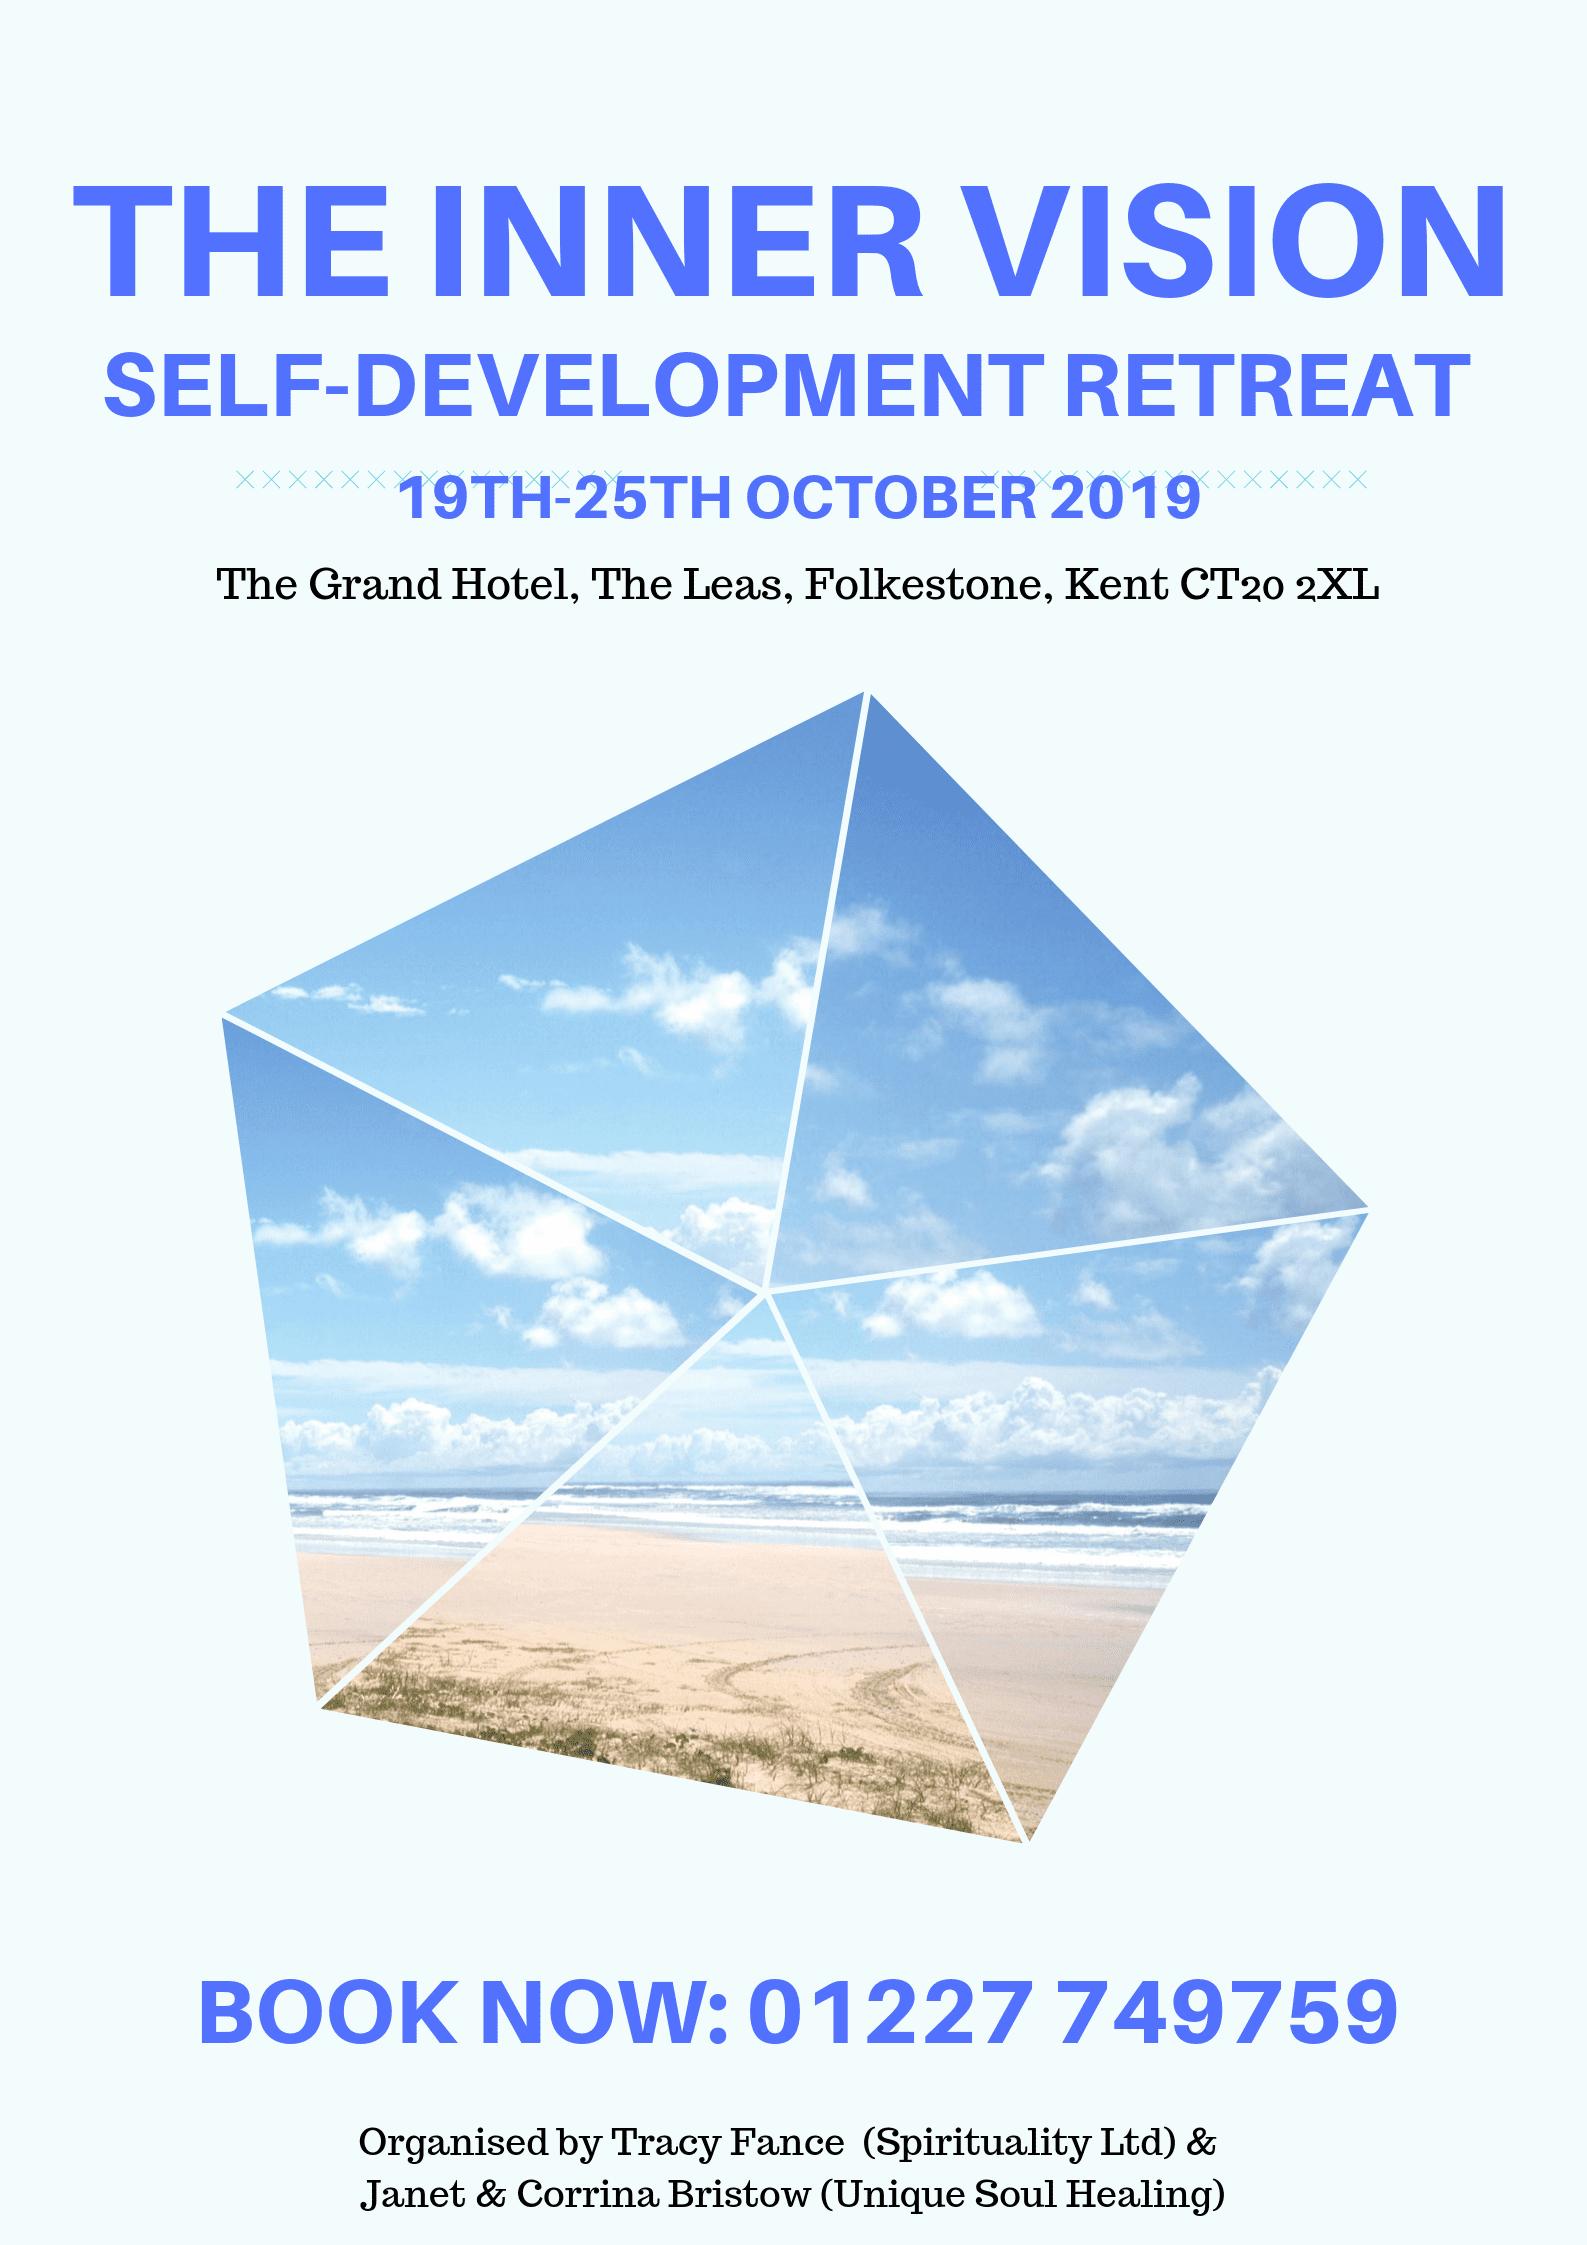 The Inner Vision Retreat